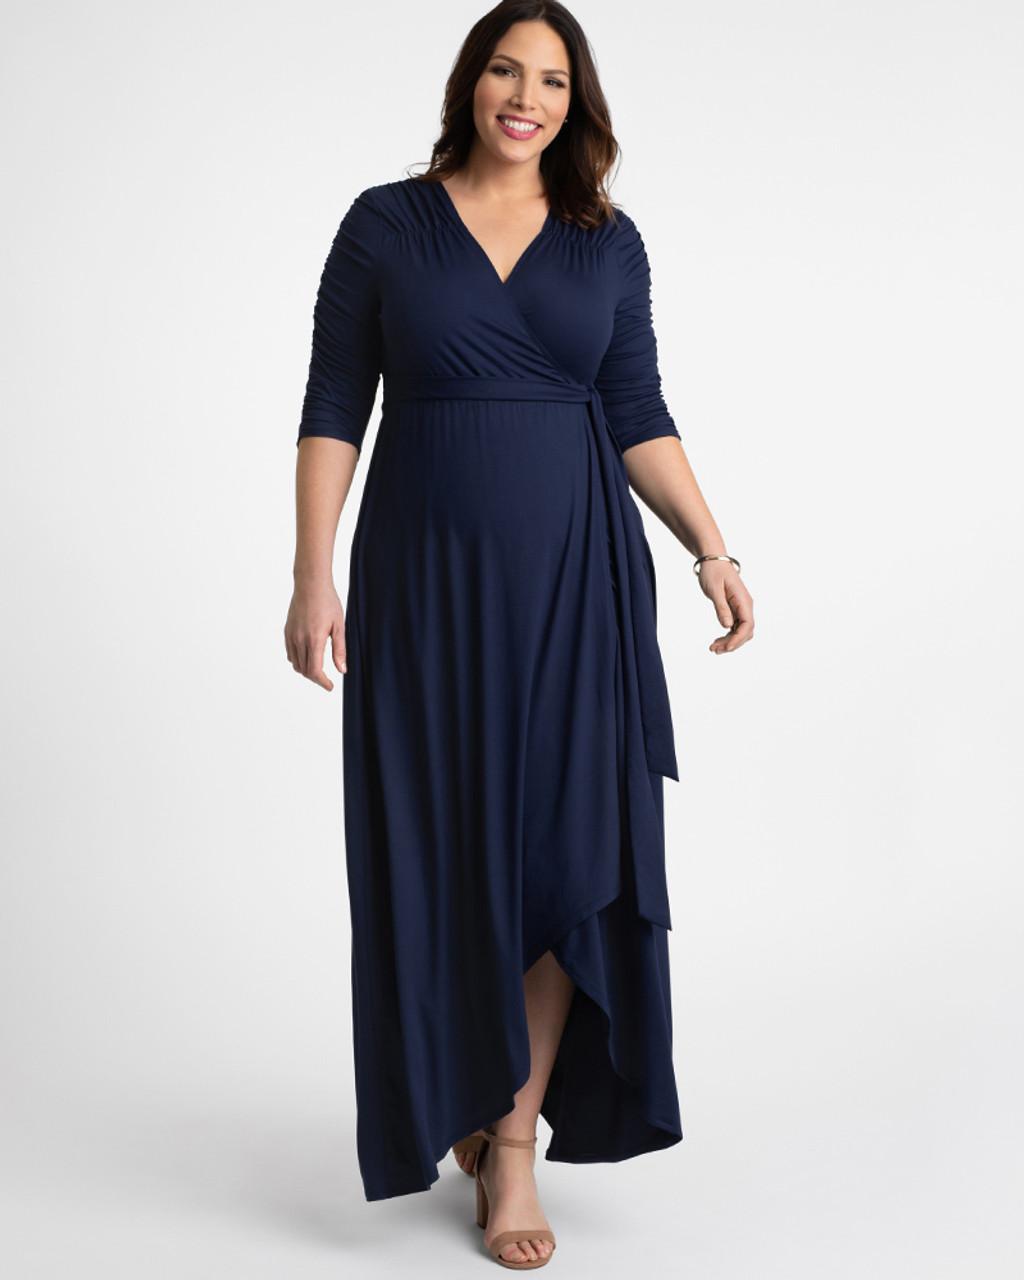 Kiyonna Women\'s Plus Size Meadow Dream Maxi Dress~Blue/Navy*13172209